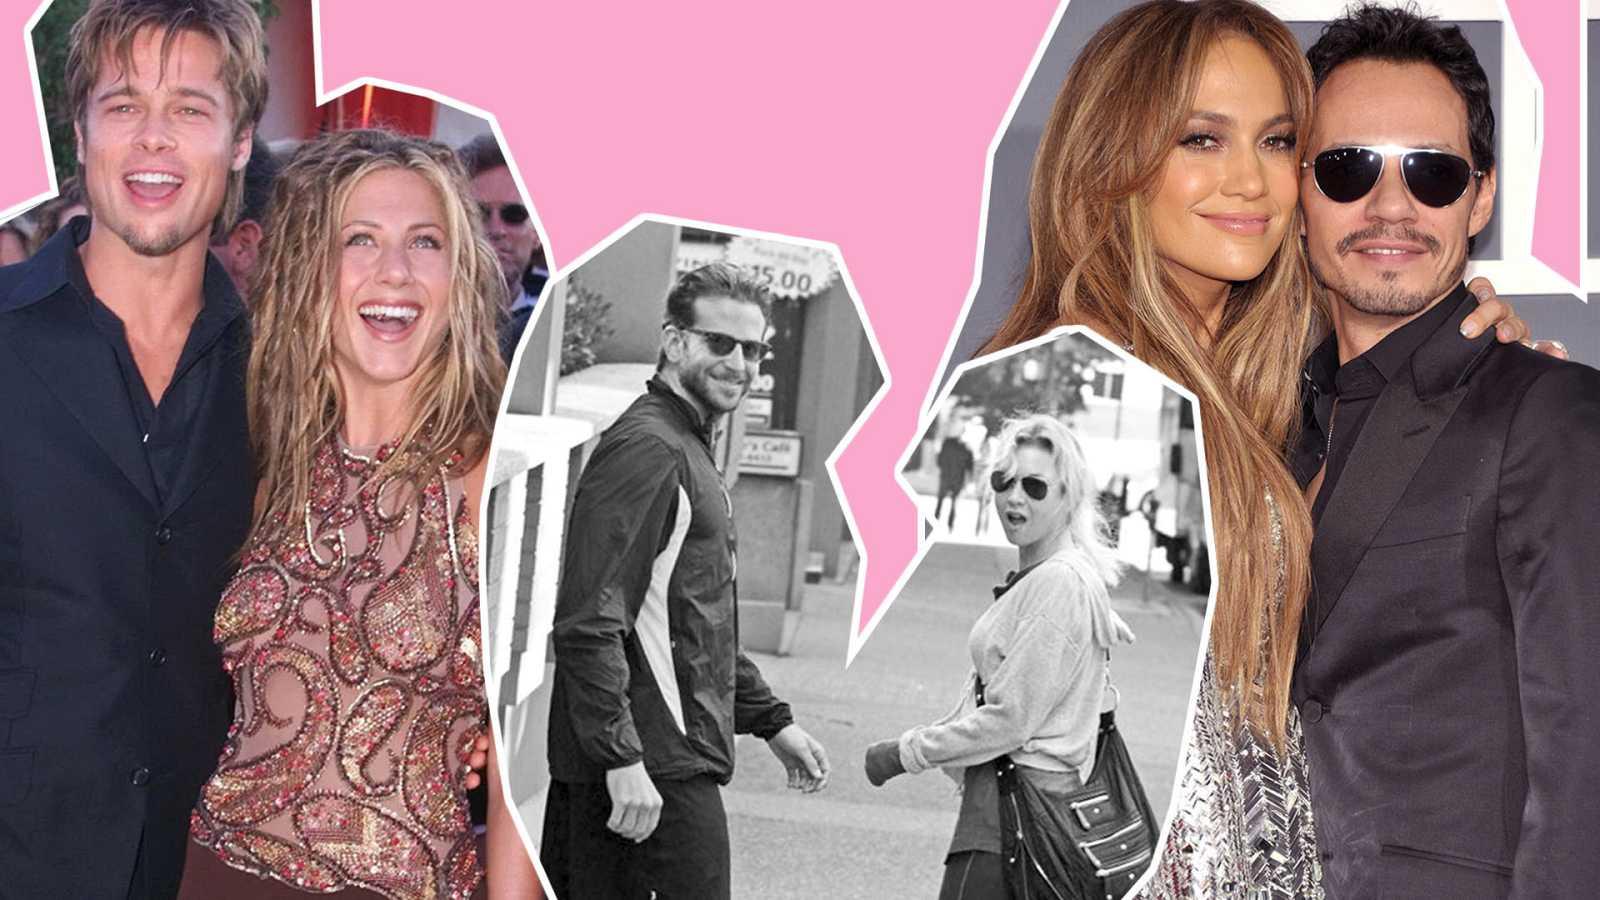 Brad Pitt y Jennifer Aniston, Renée Zellweger y Bradley Cooper, Marc Anthony y J. Lo